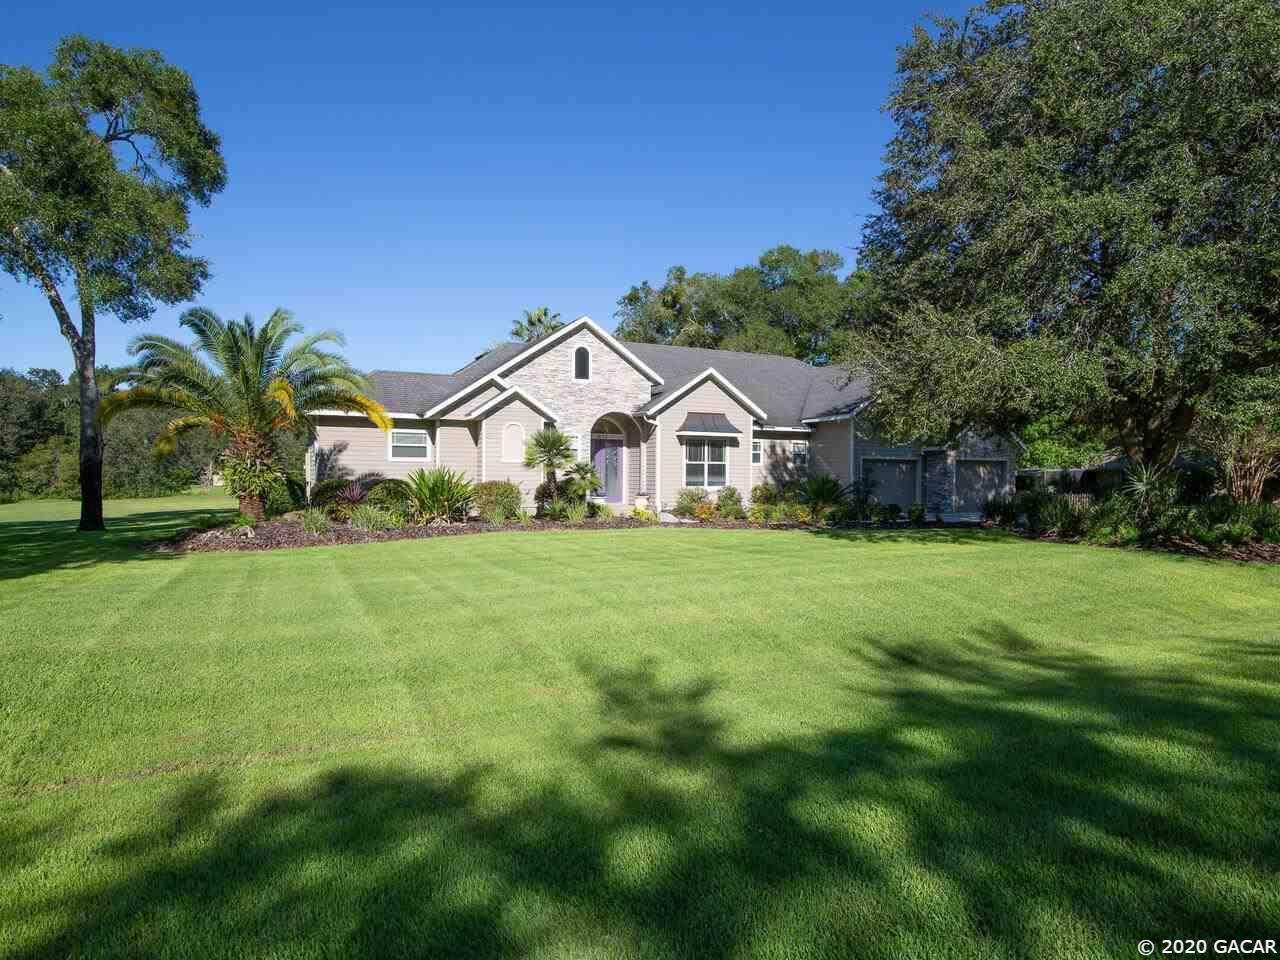 2636 SW 101 Terrace, Gainesville, FL 32608 - #: 438144